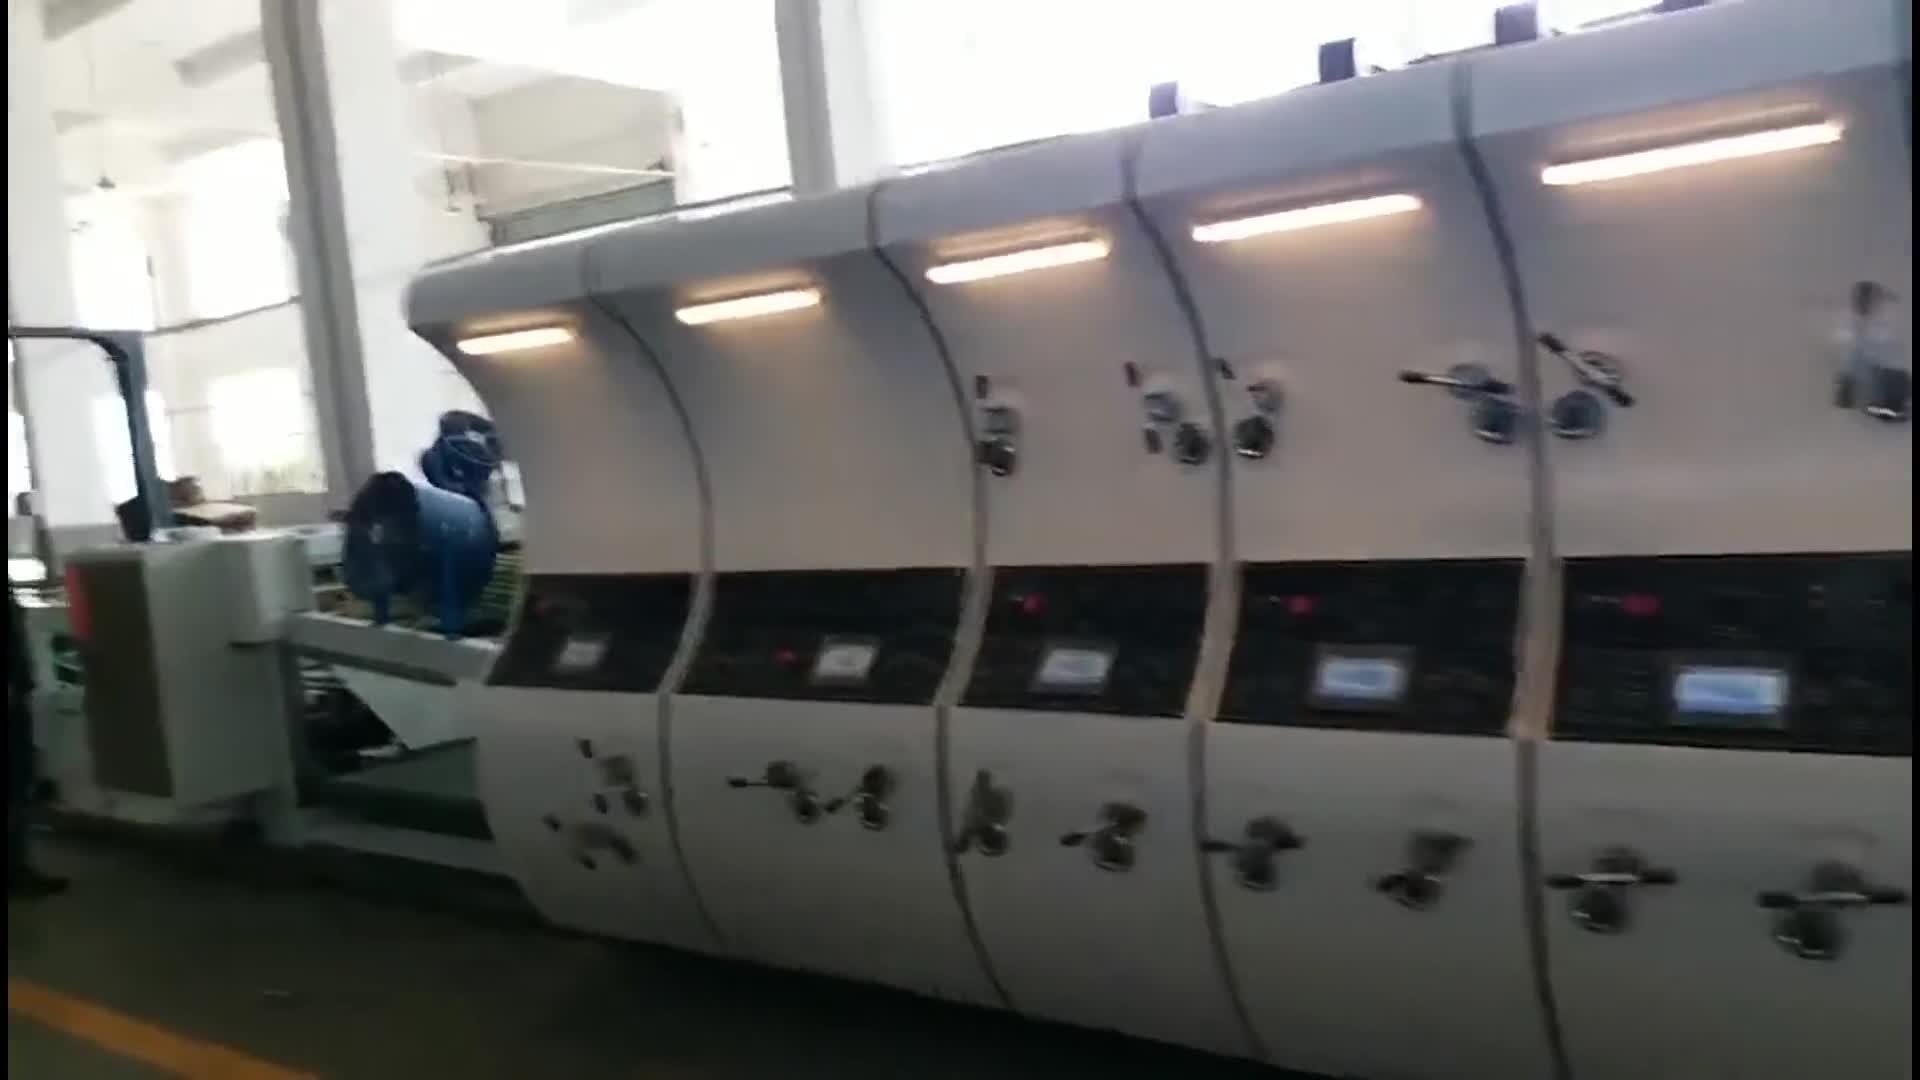 Flexo Printing Pizza Box Making Machines Corrugated Box Manufacturing Machine Price